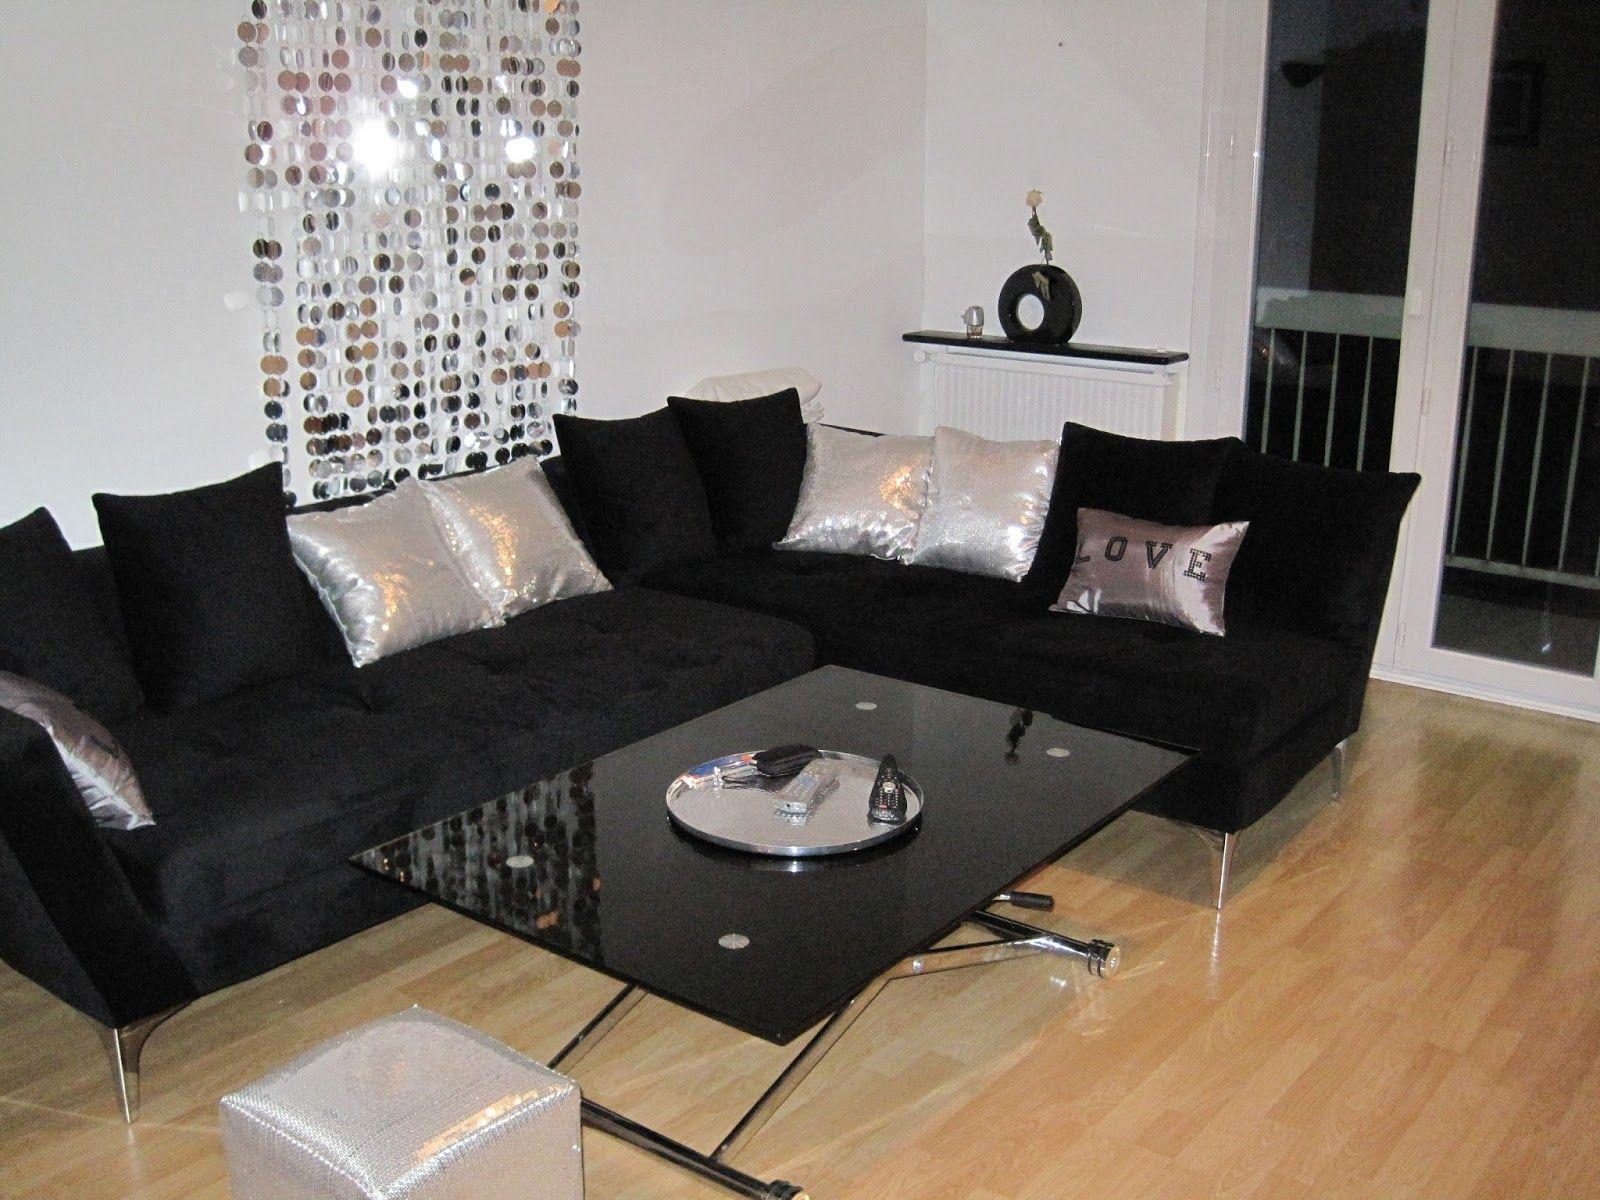 ديكور غرف ديكورات وتصاميم طاولات الصالون Home Decor Luxe Decor Front Room